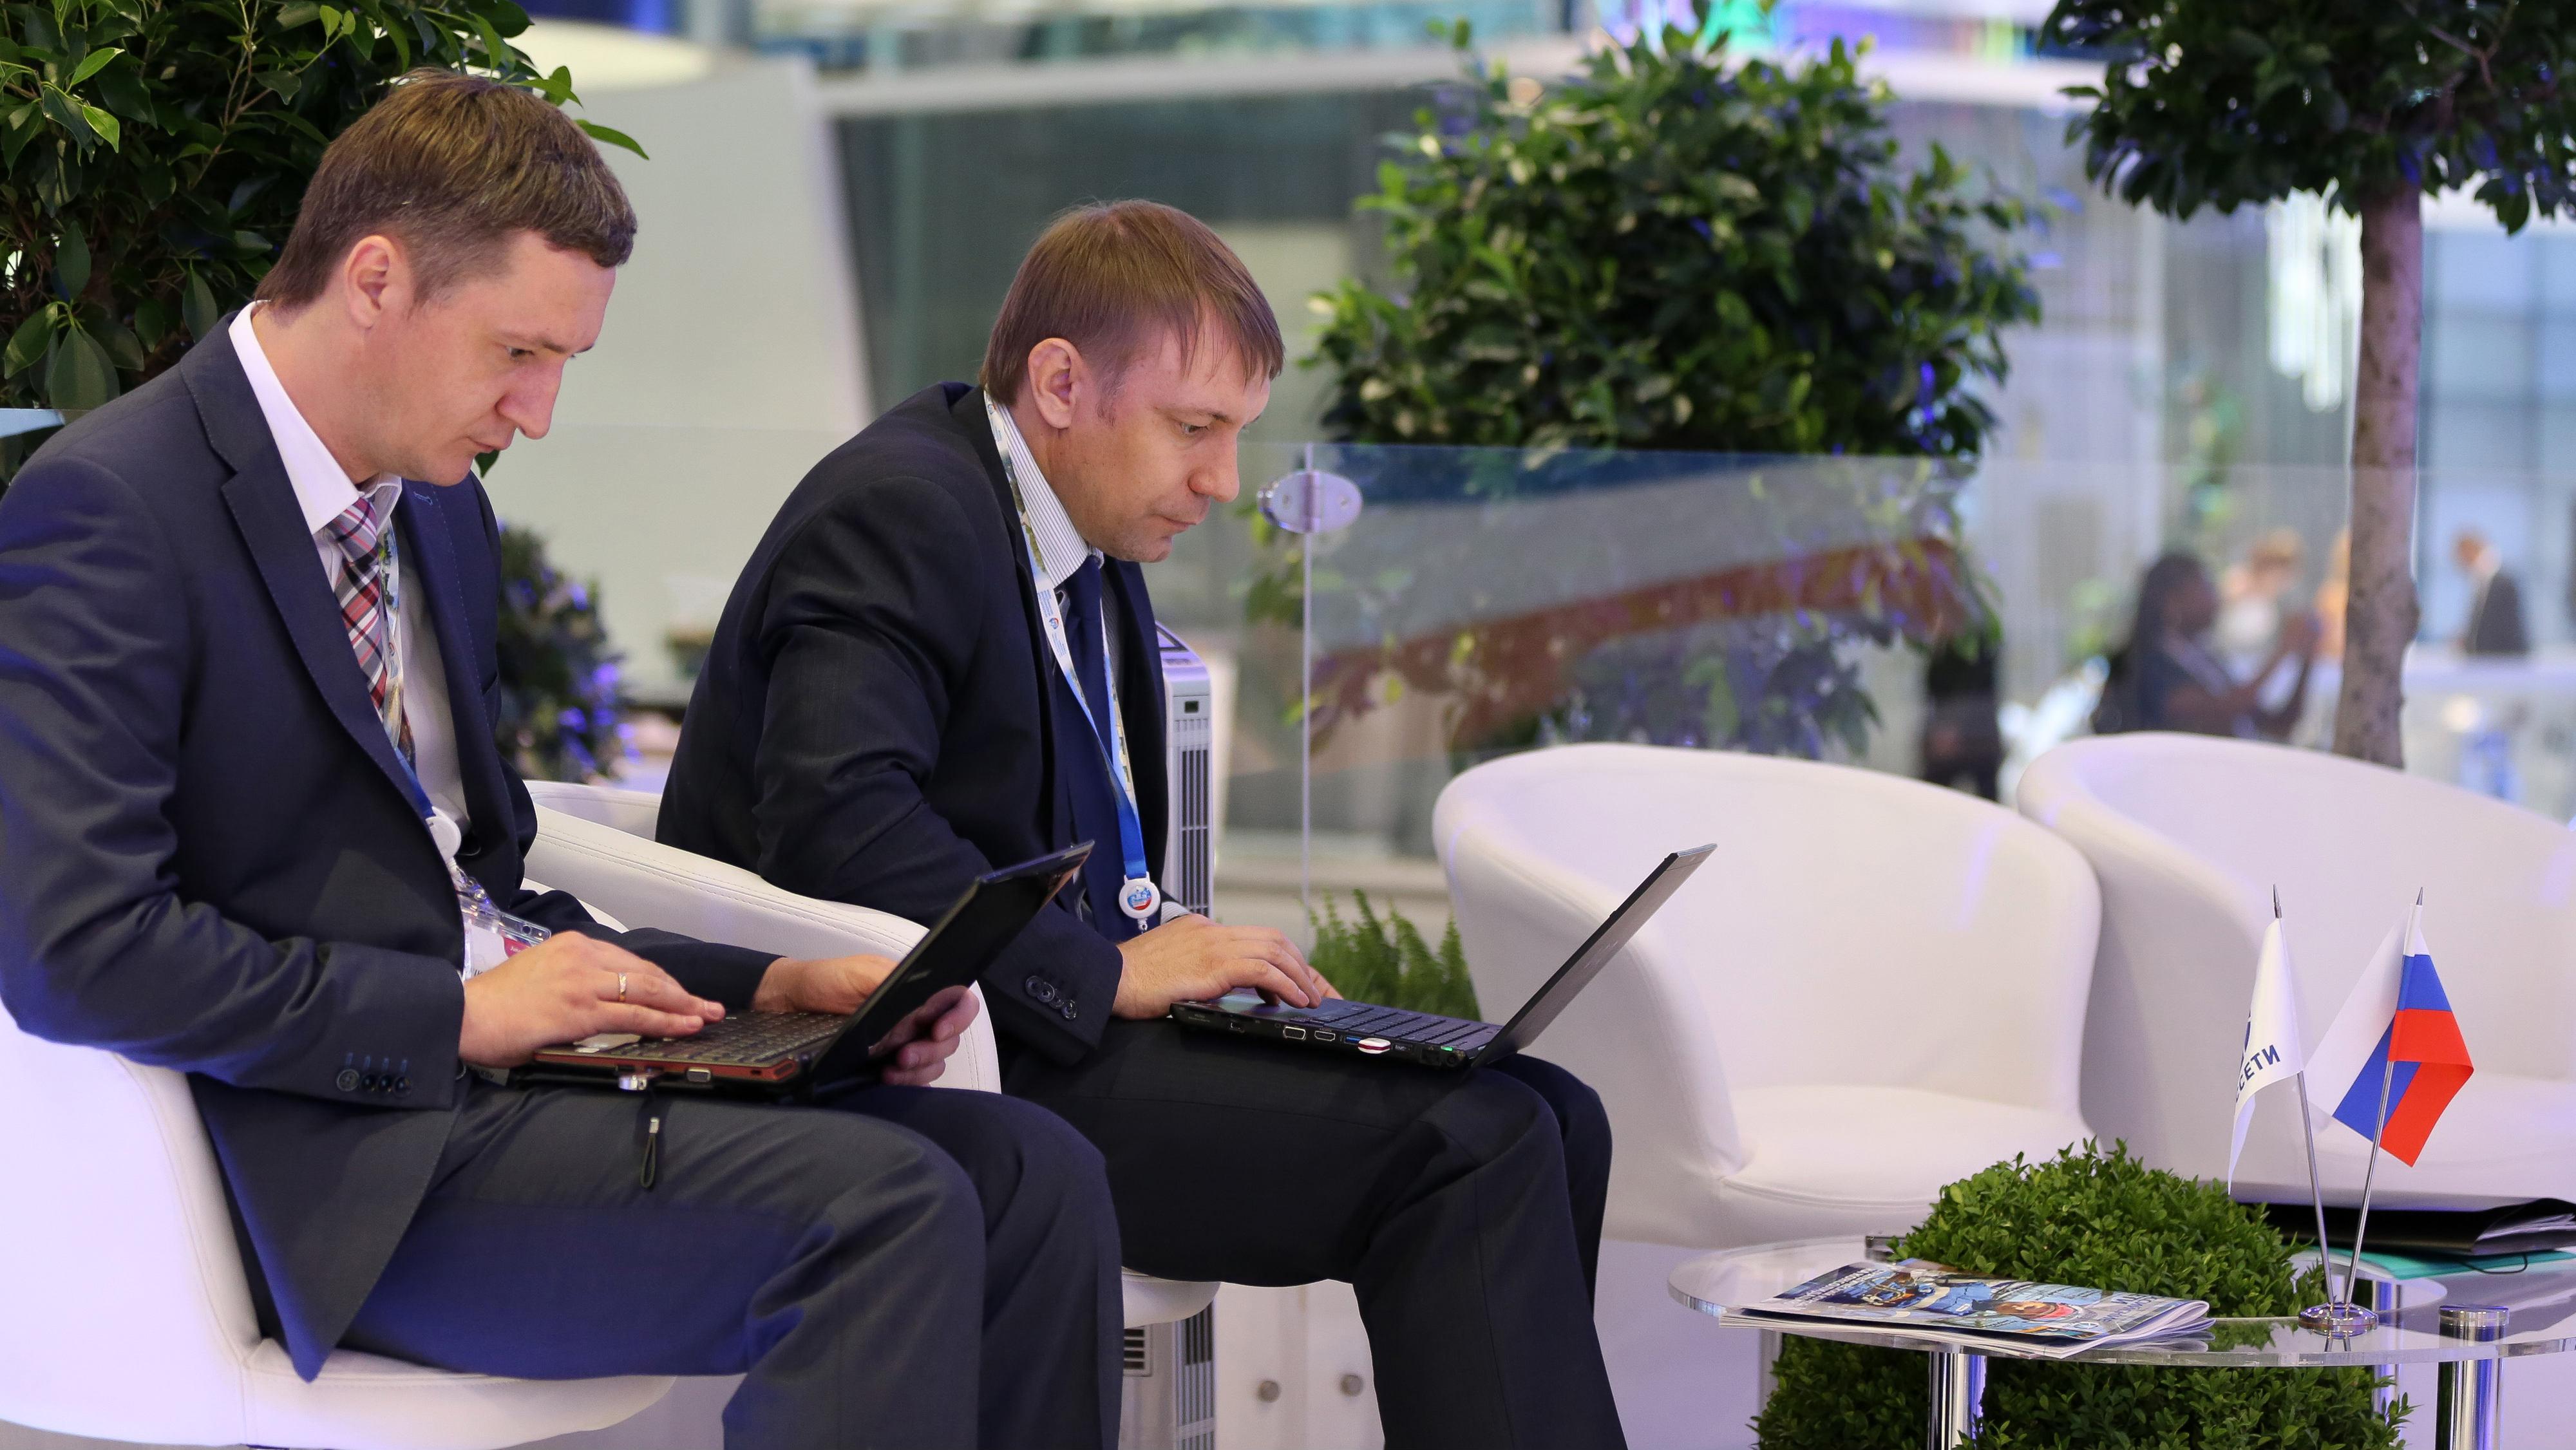 Russian men emailing